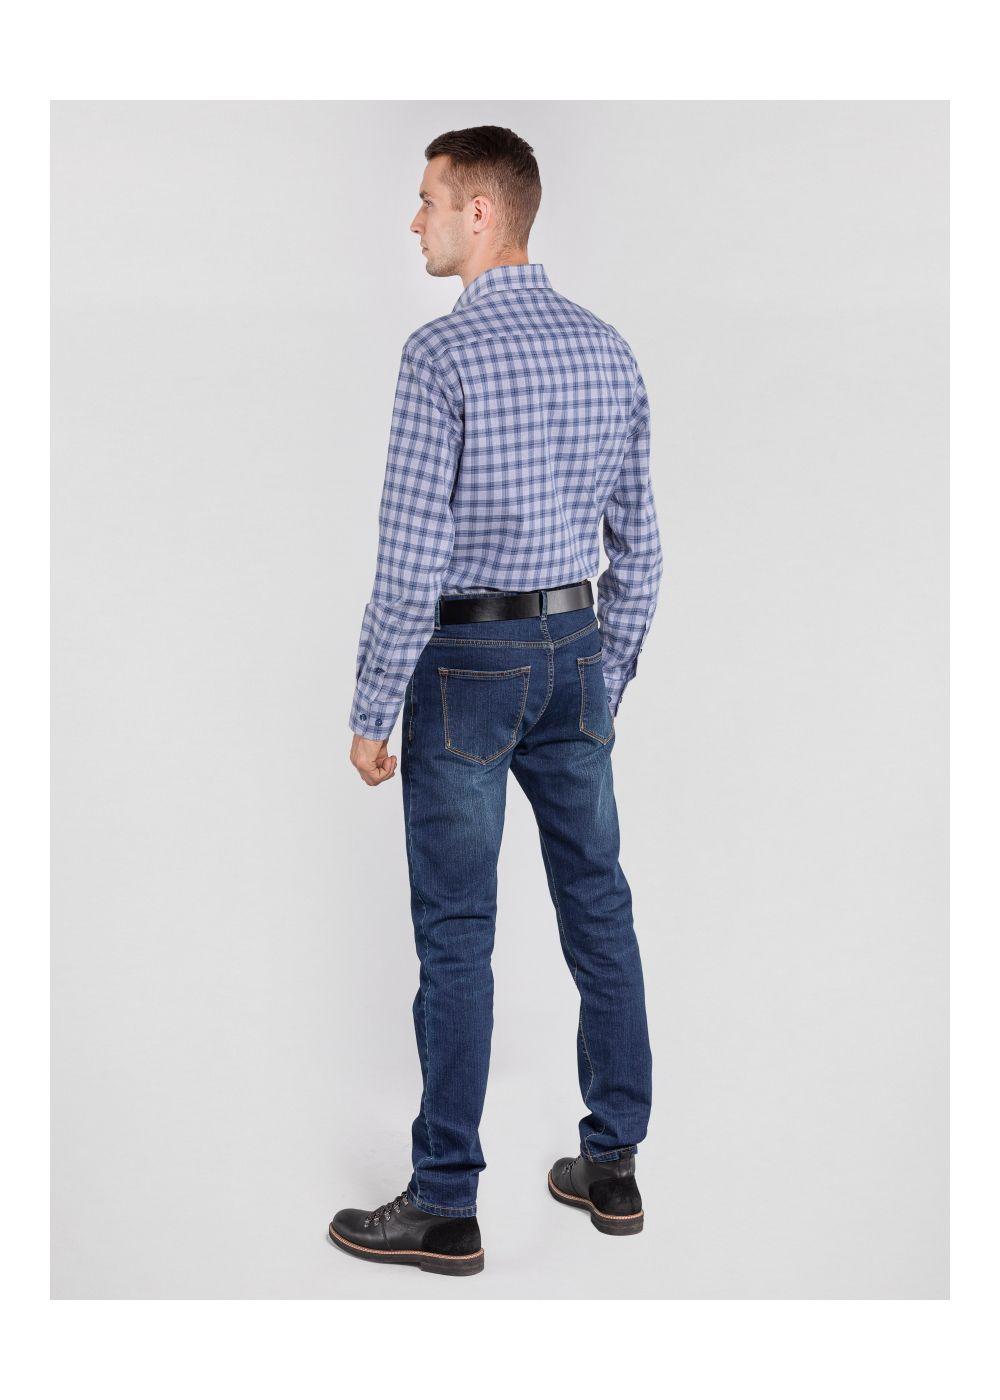 Spodnie męskie JEAMT-0010-69(Z20)